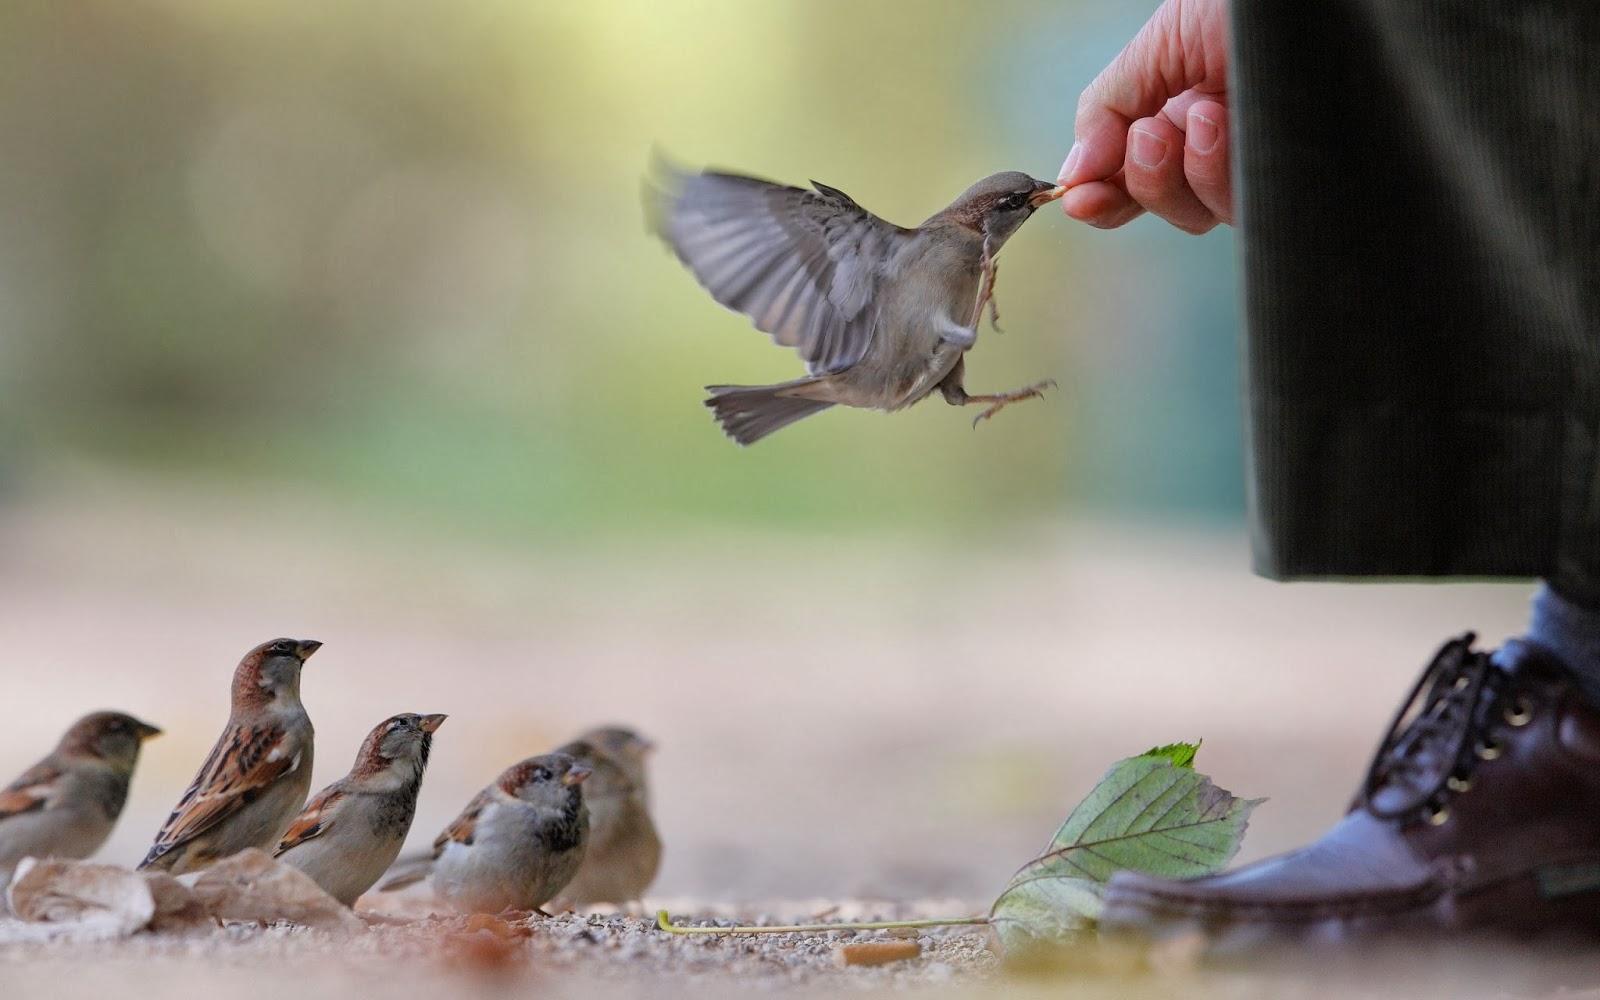 burung-burung pipit-tangan-makanan-manusia-wallpaper-2560x1600